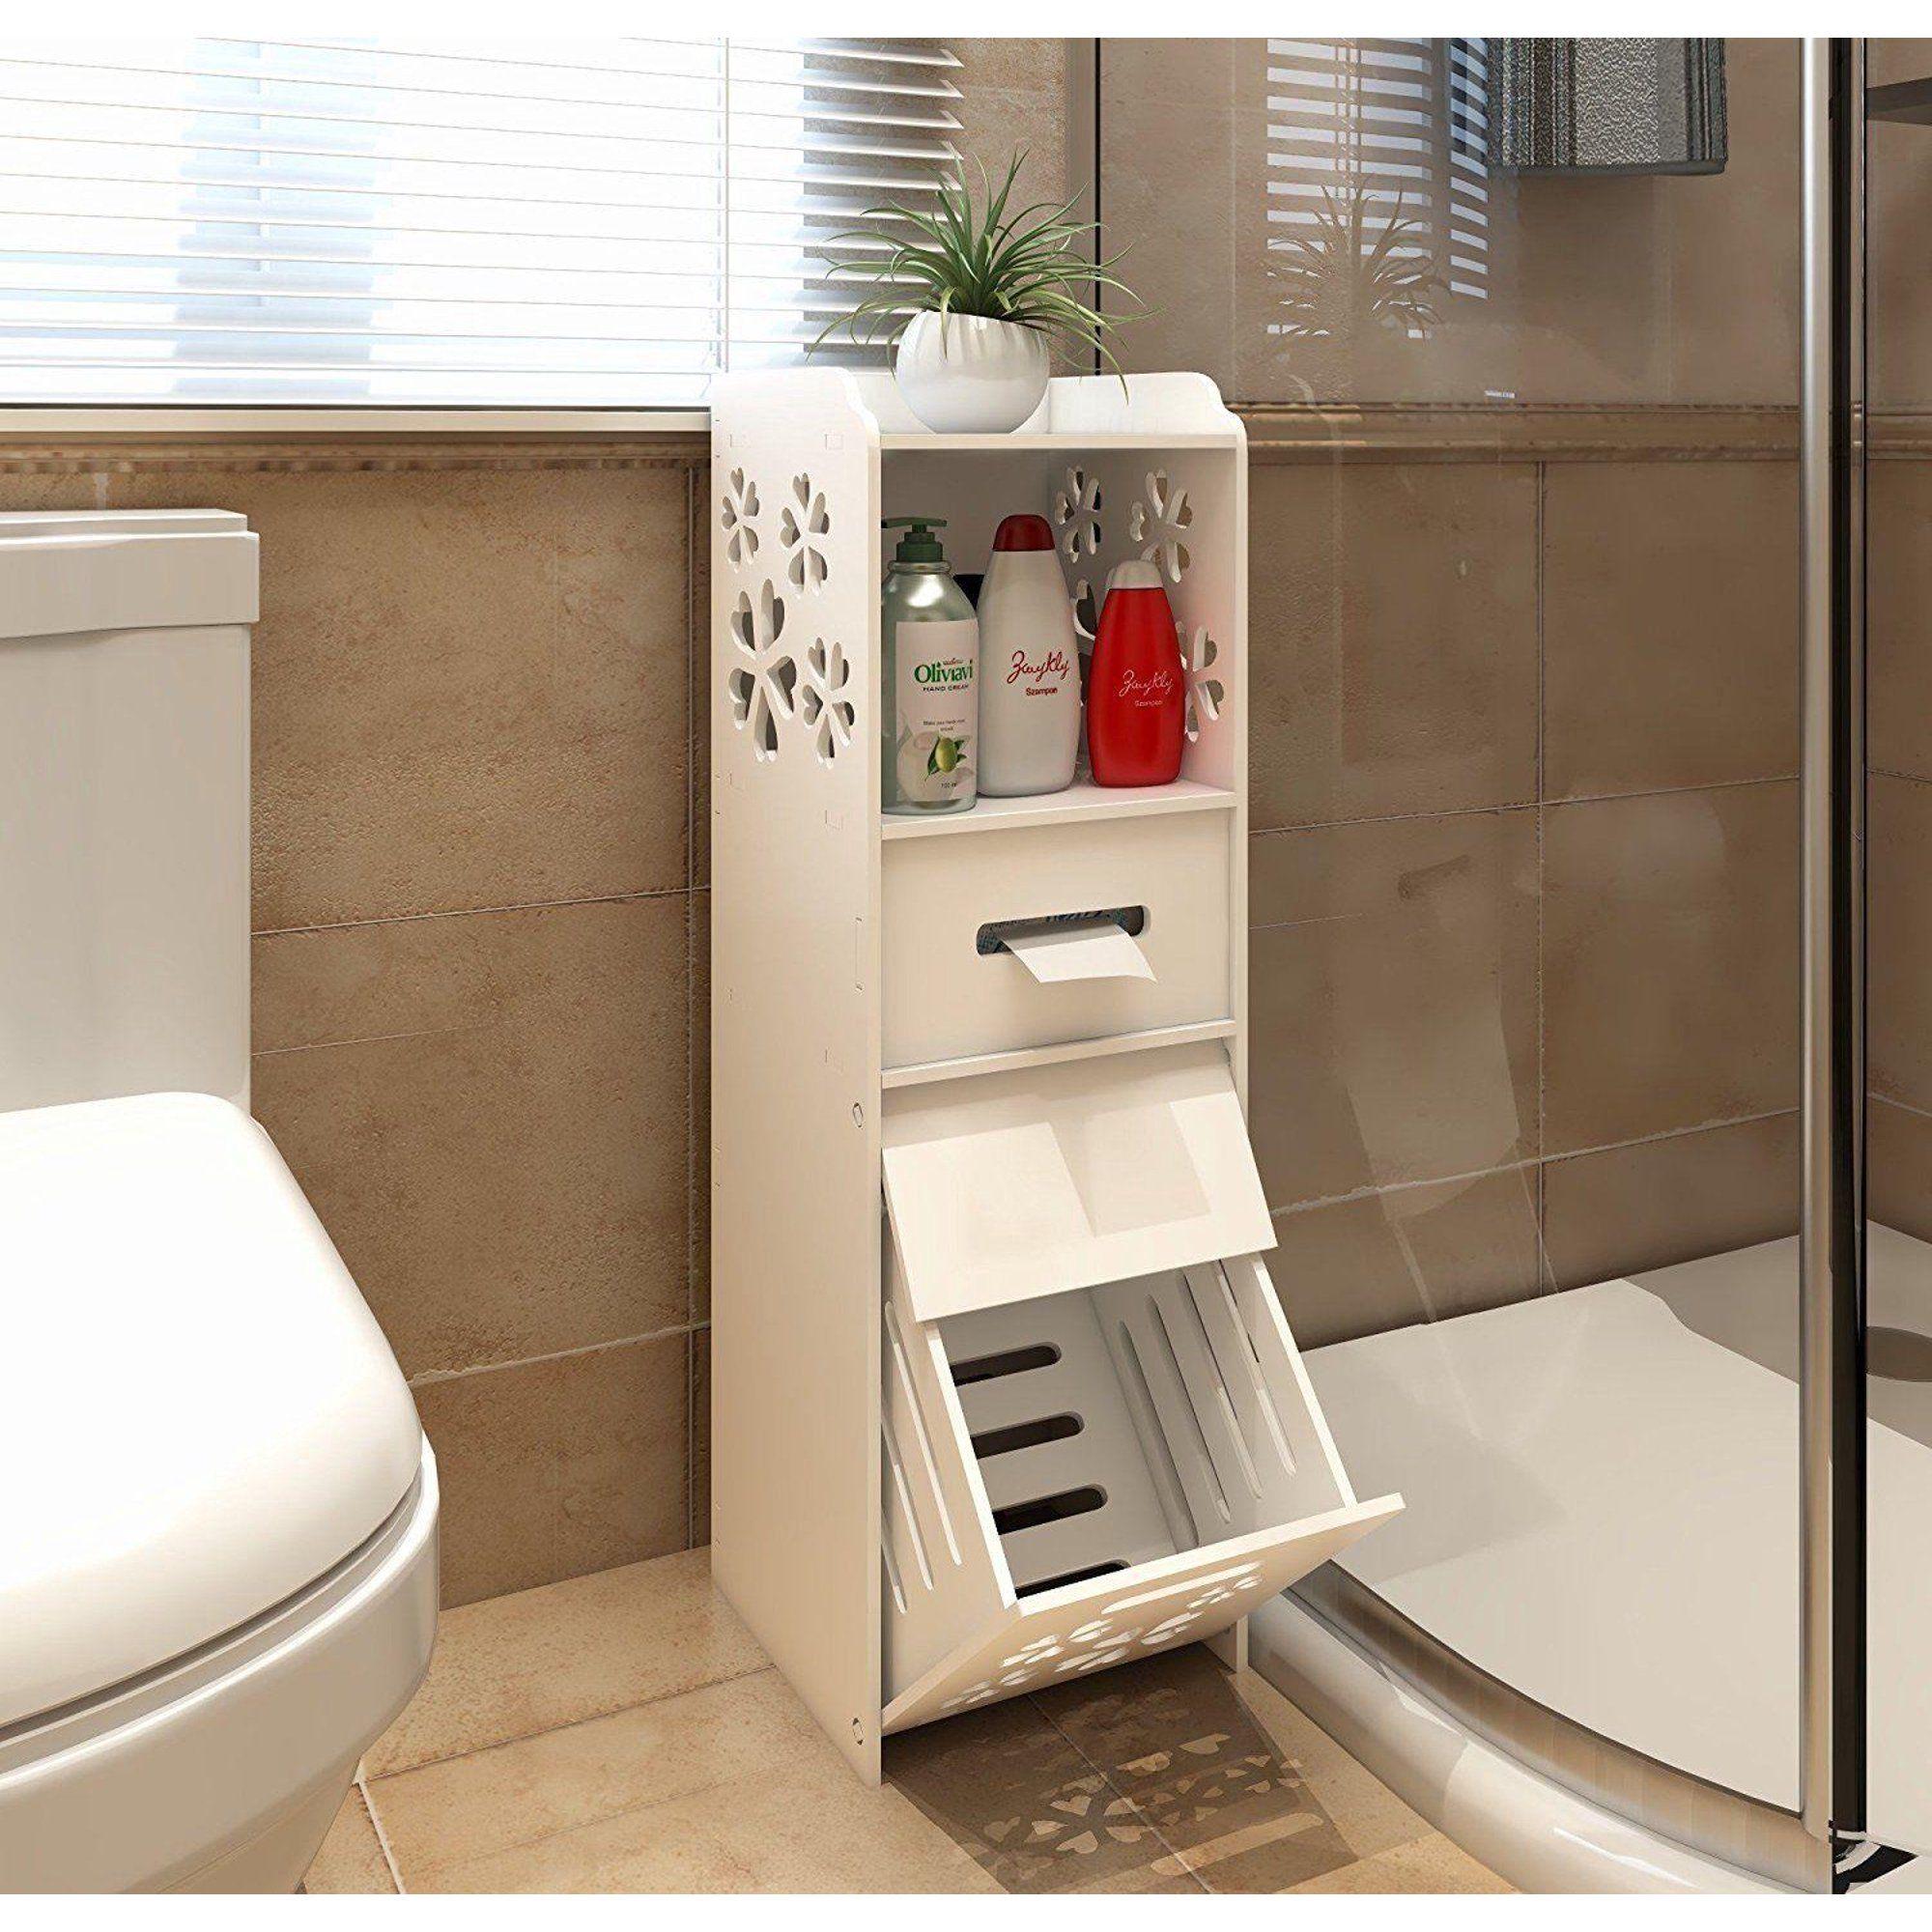 Ktaxon Slim Bathroom Storage Cabinet, Bathroom Toilet Slim Floor Cabinet Narrow Storage Cupboard With Drawers